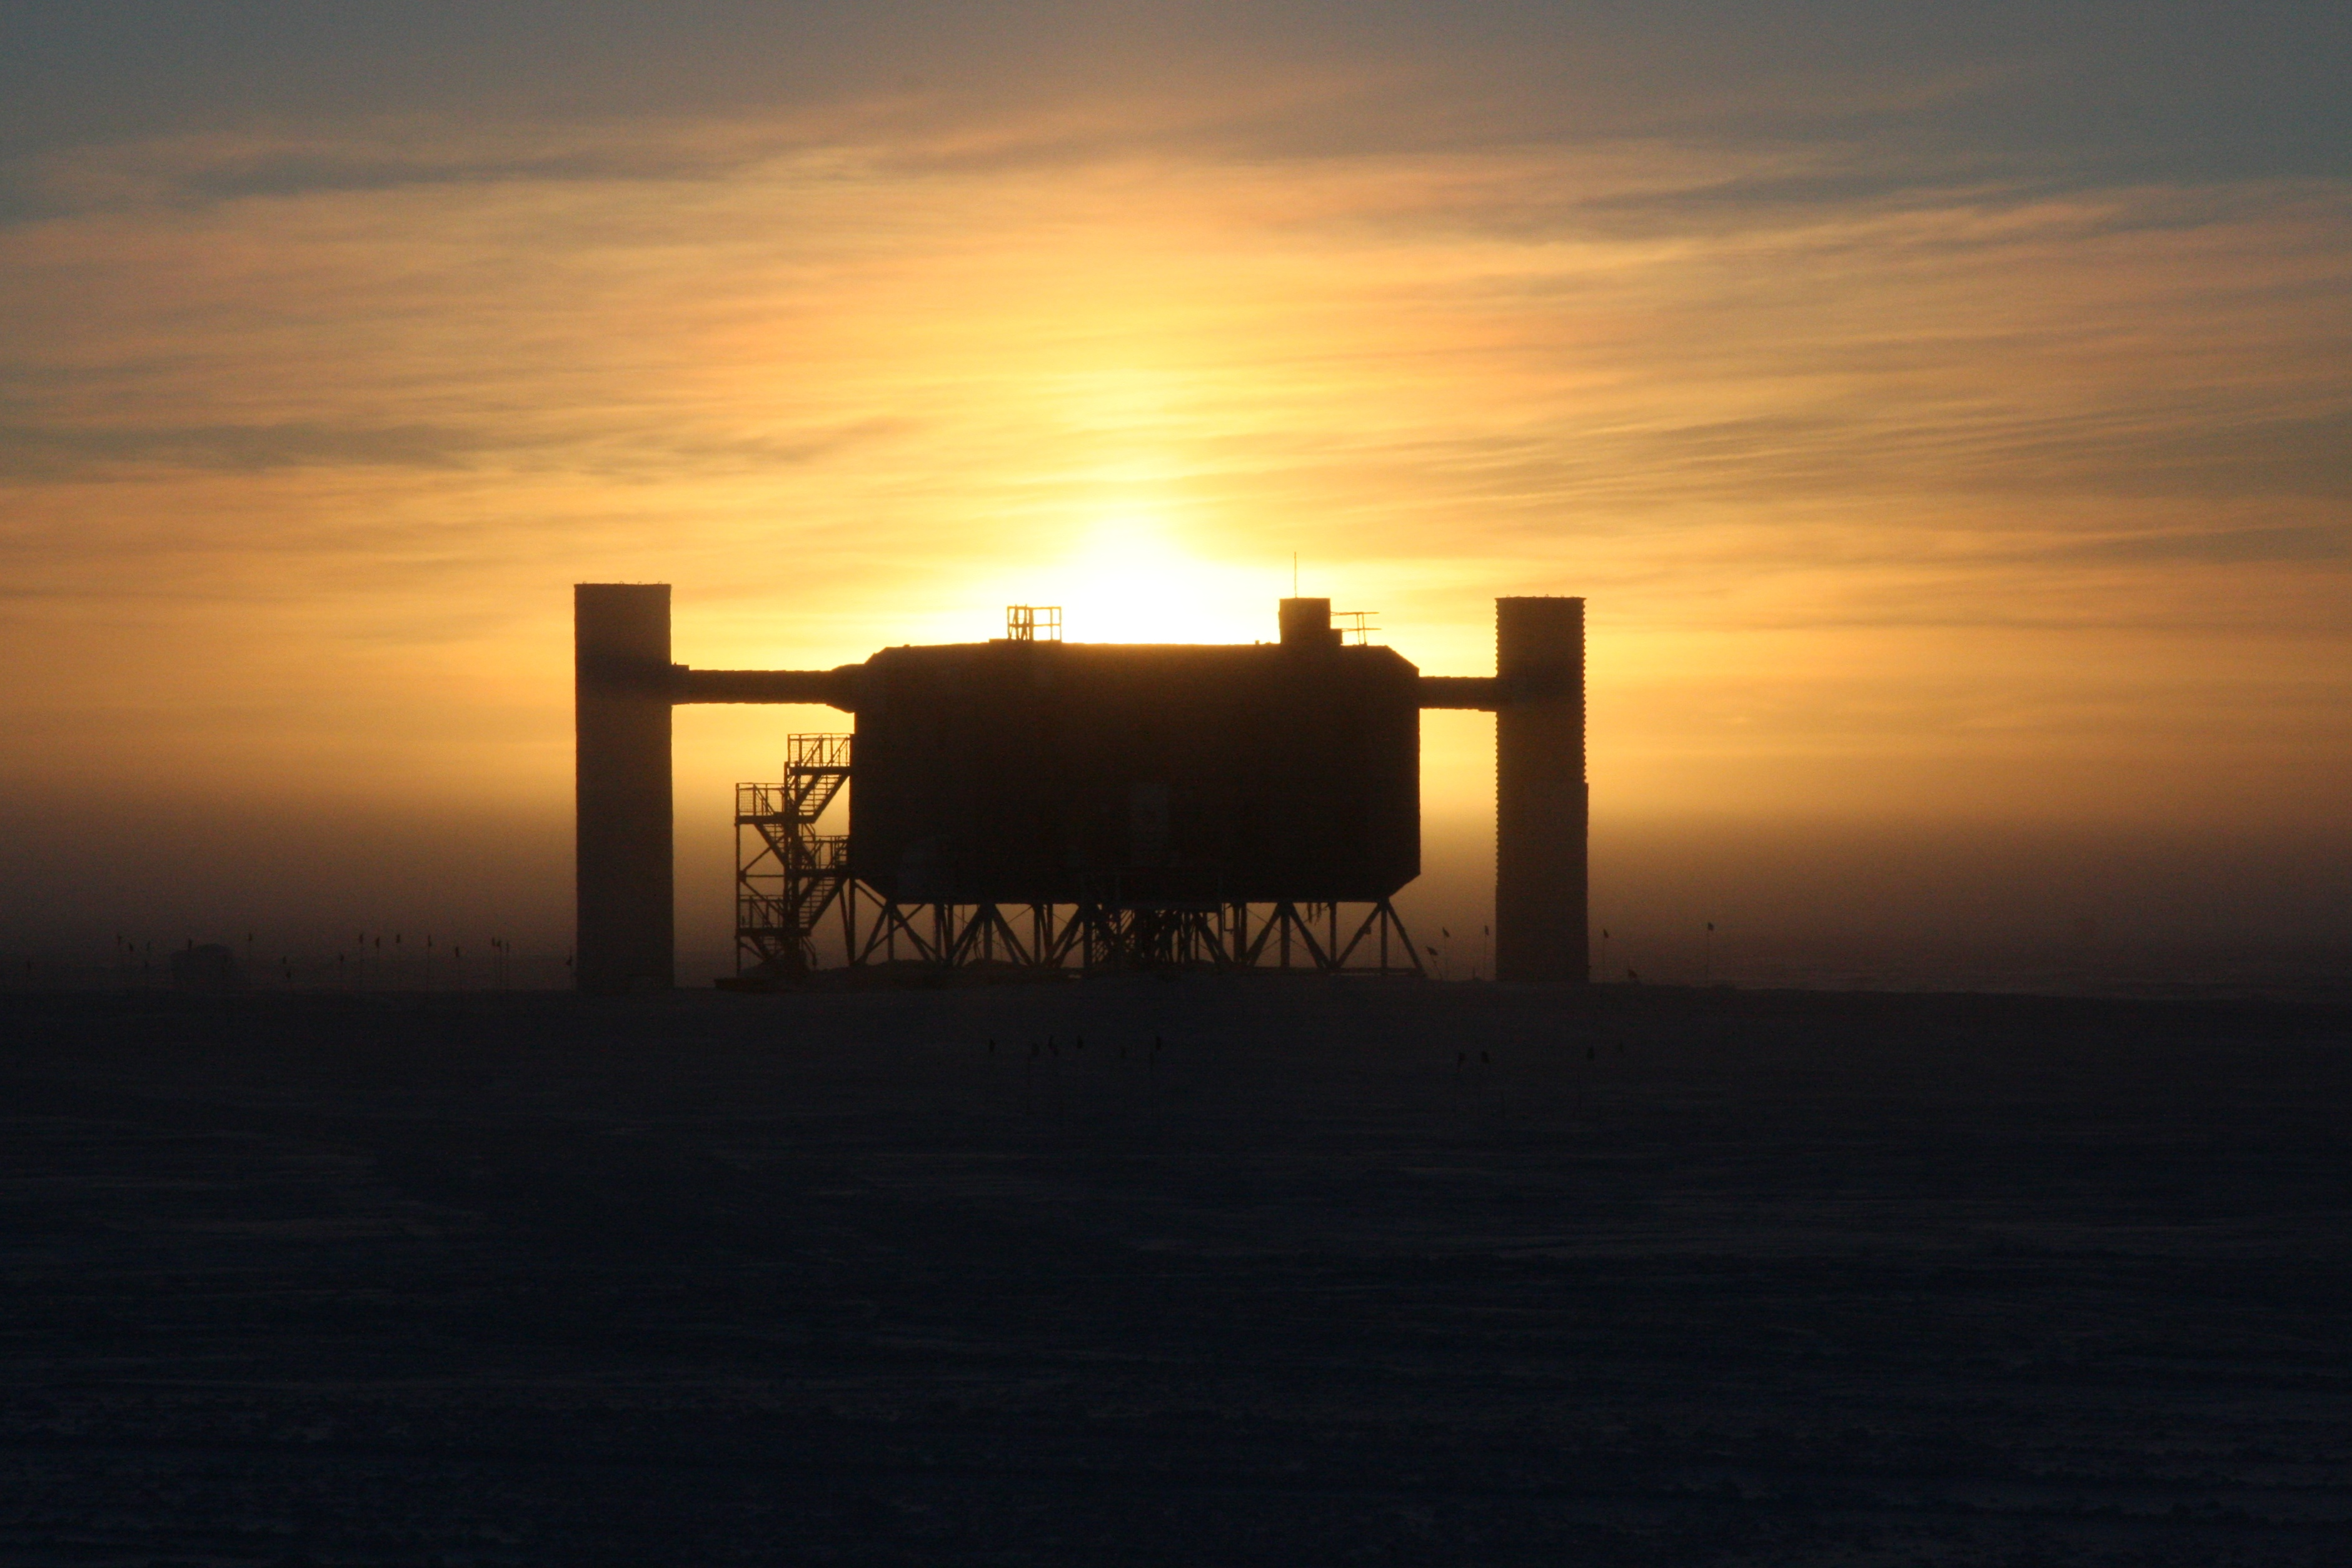 Sun setting behing the IceCube Lab